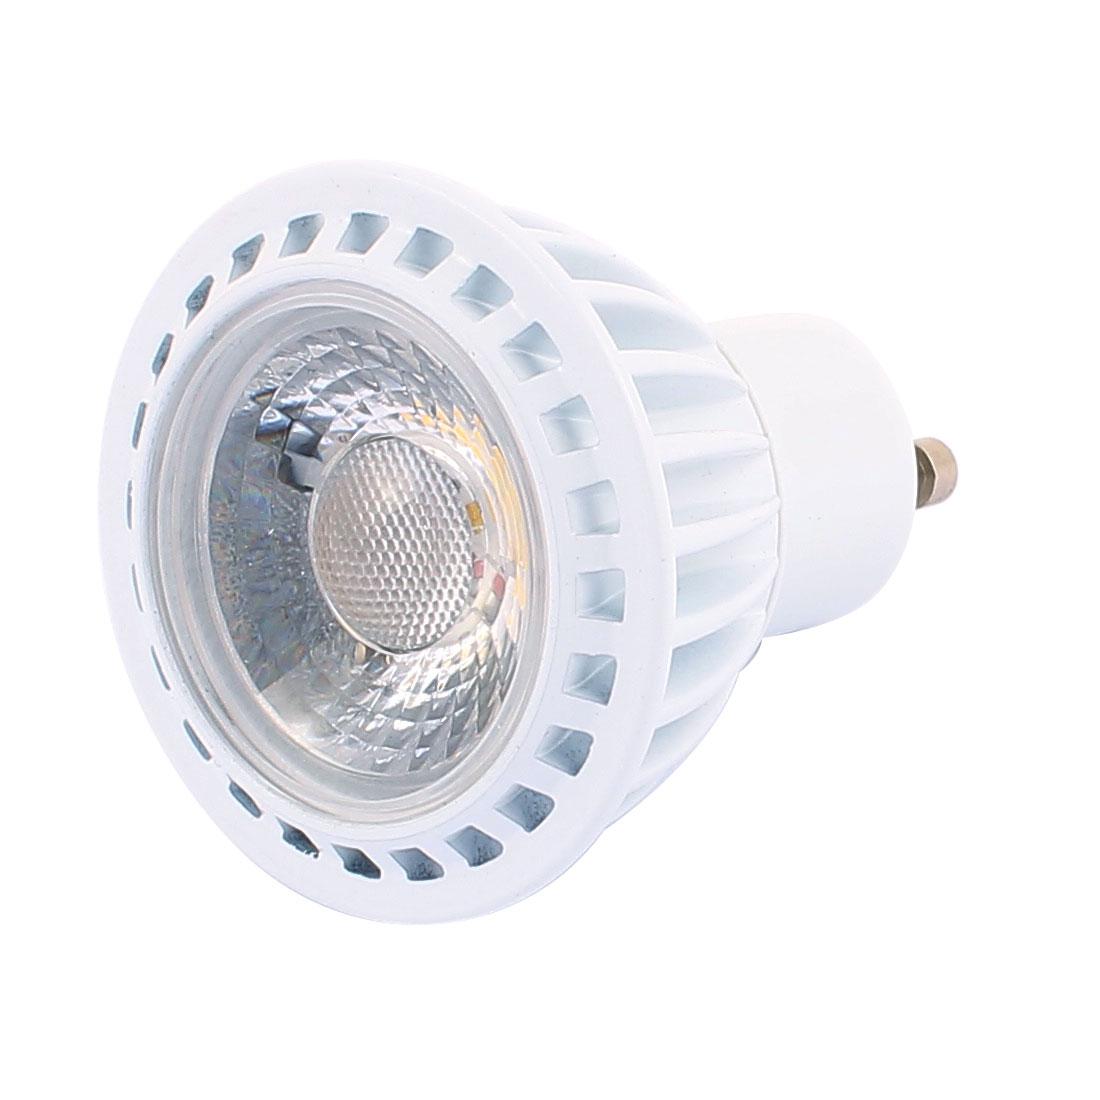 AC85-265V 3W GU10 COB Integrated Chip LED Spotlight Lamp Bulb Downlight Pure White